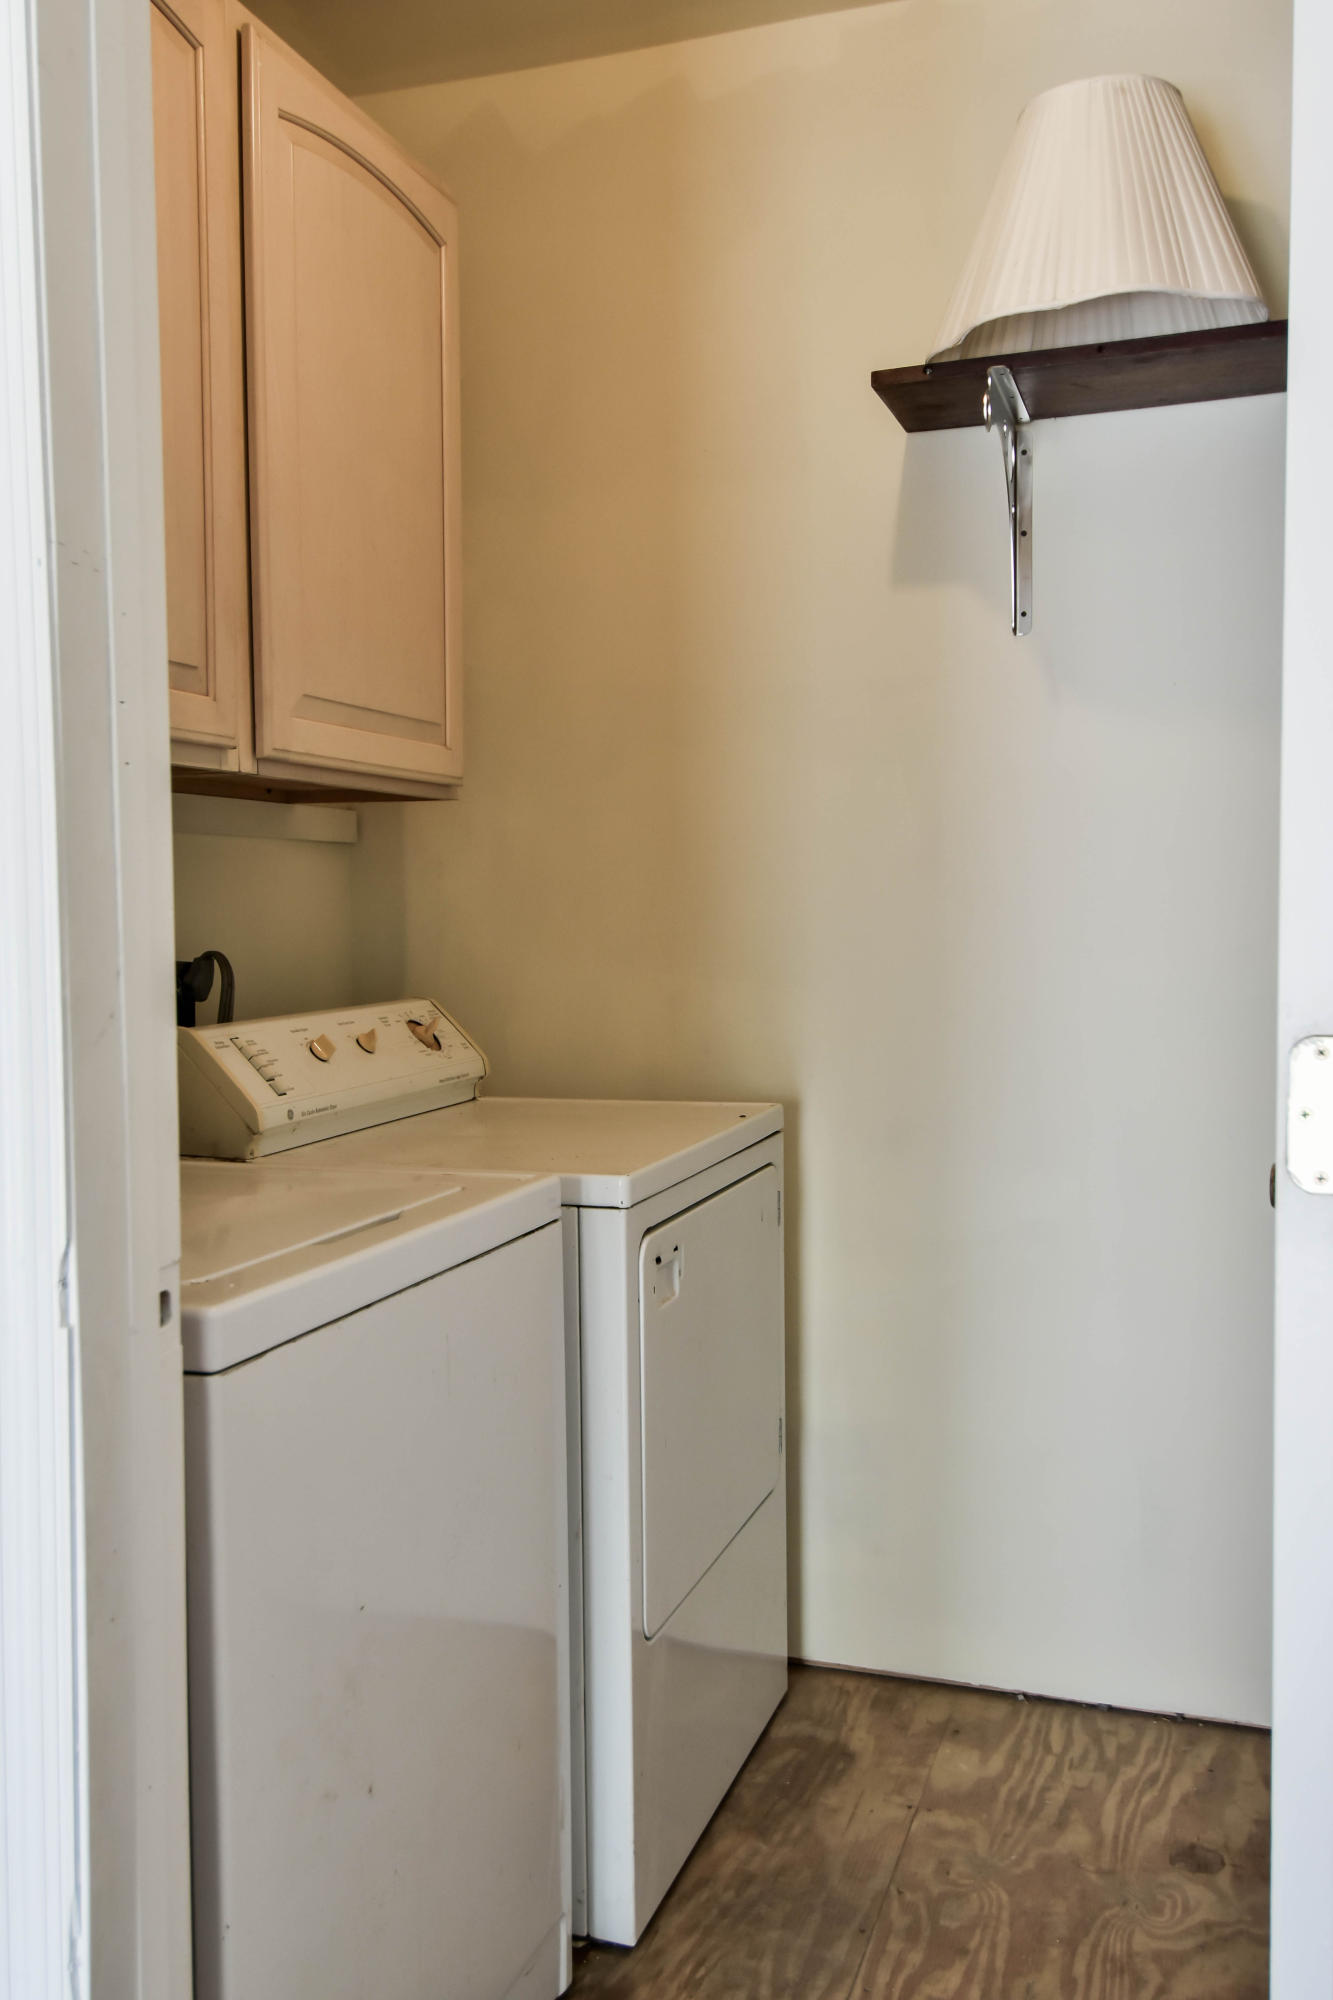 Jasper Terrace Homes For Sale - 1407 Hindman, Mount Pleasant, SC - 10